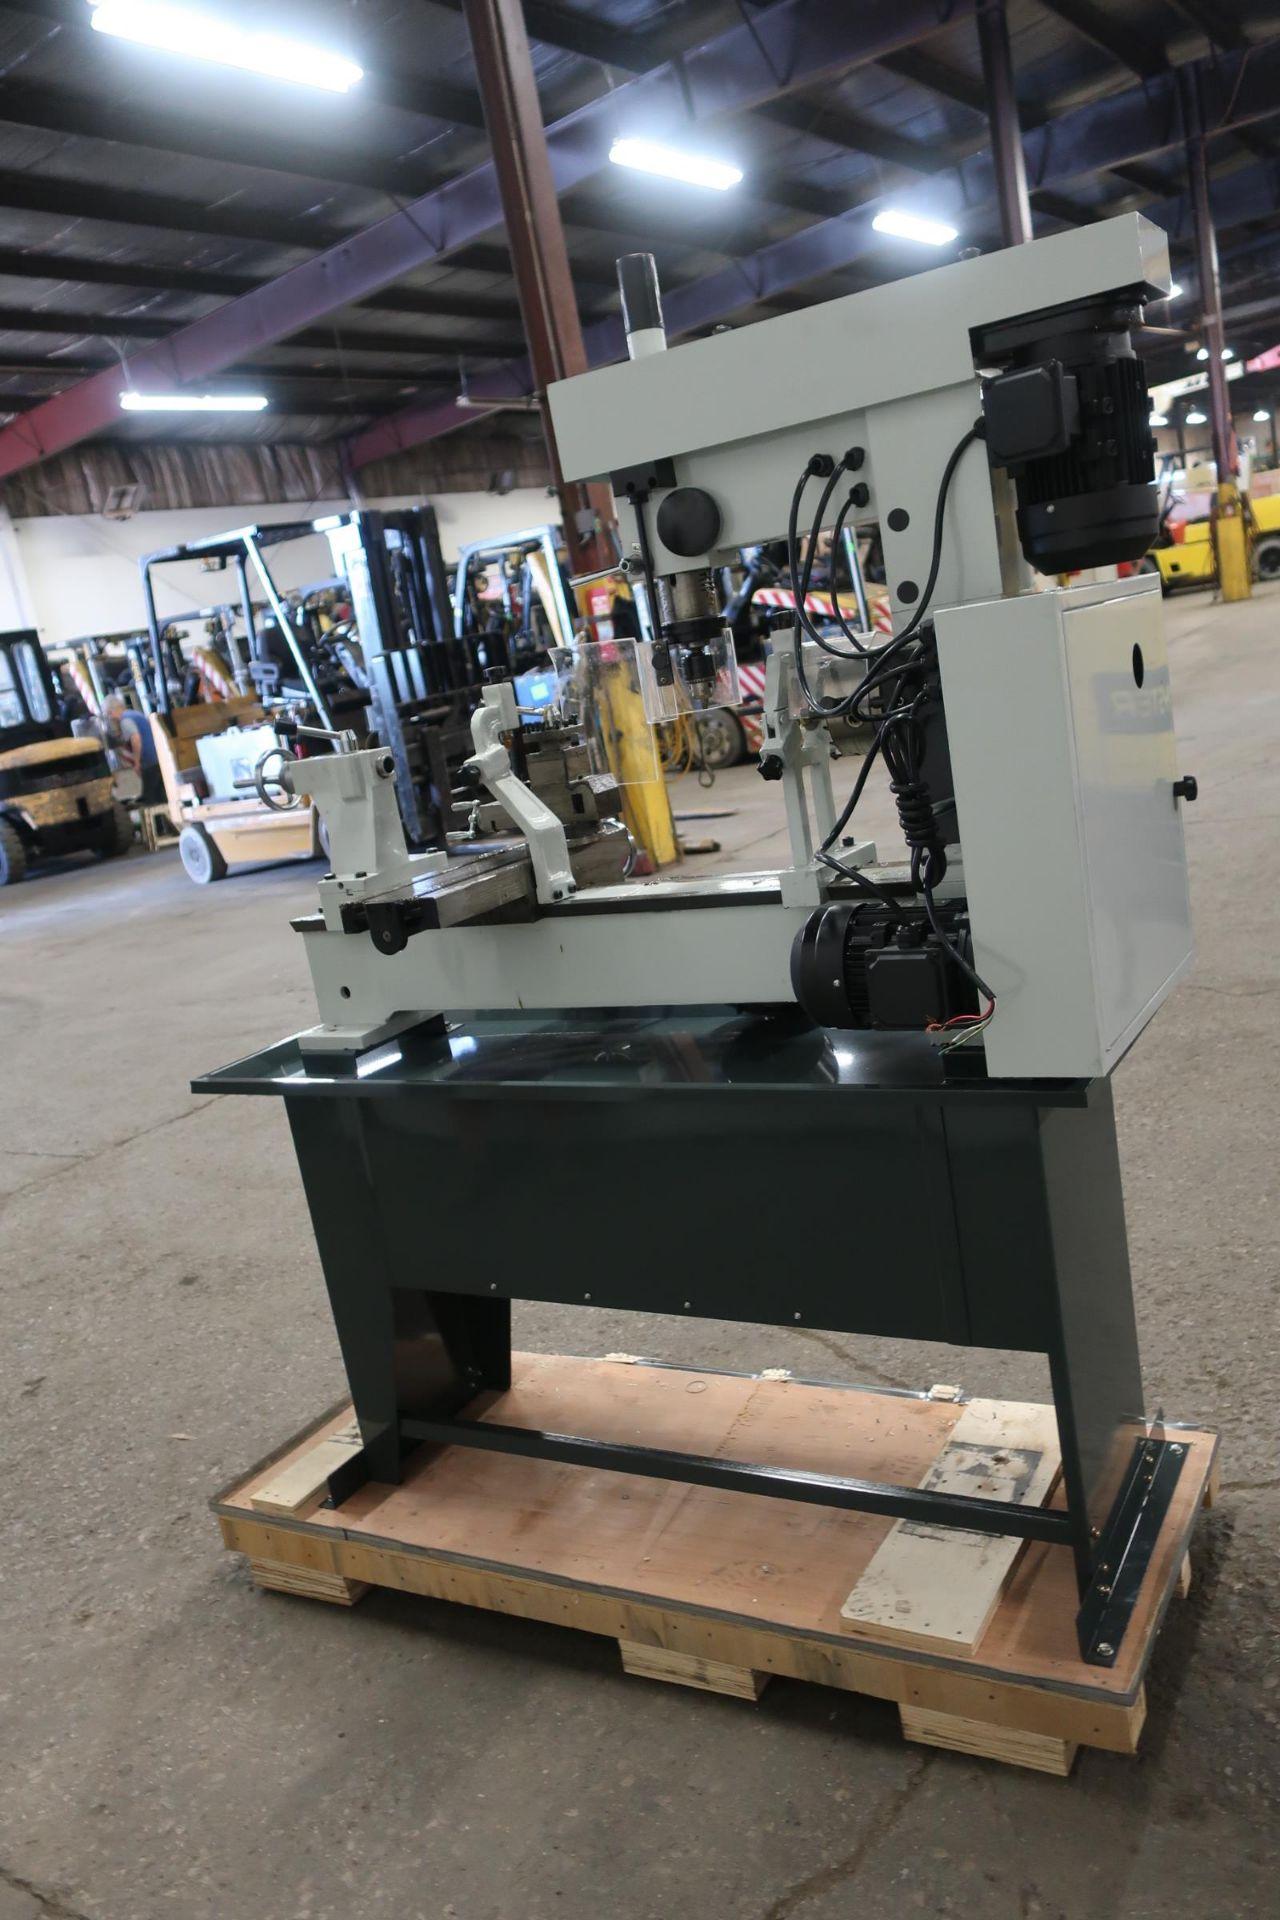 "Bernardo Lathe / Mill / Drill Combo LATHE: 31.5"" X 16.5"" swing, MT4 spindle, MT3 tailstock, DRILL/ - Image 2 of 3"